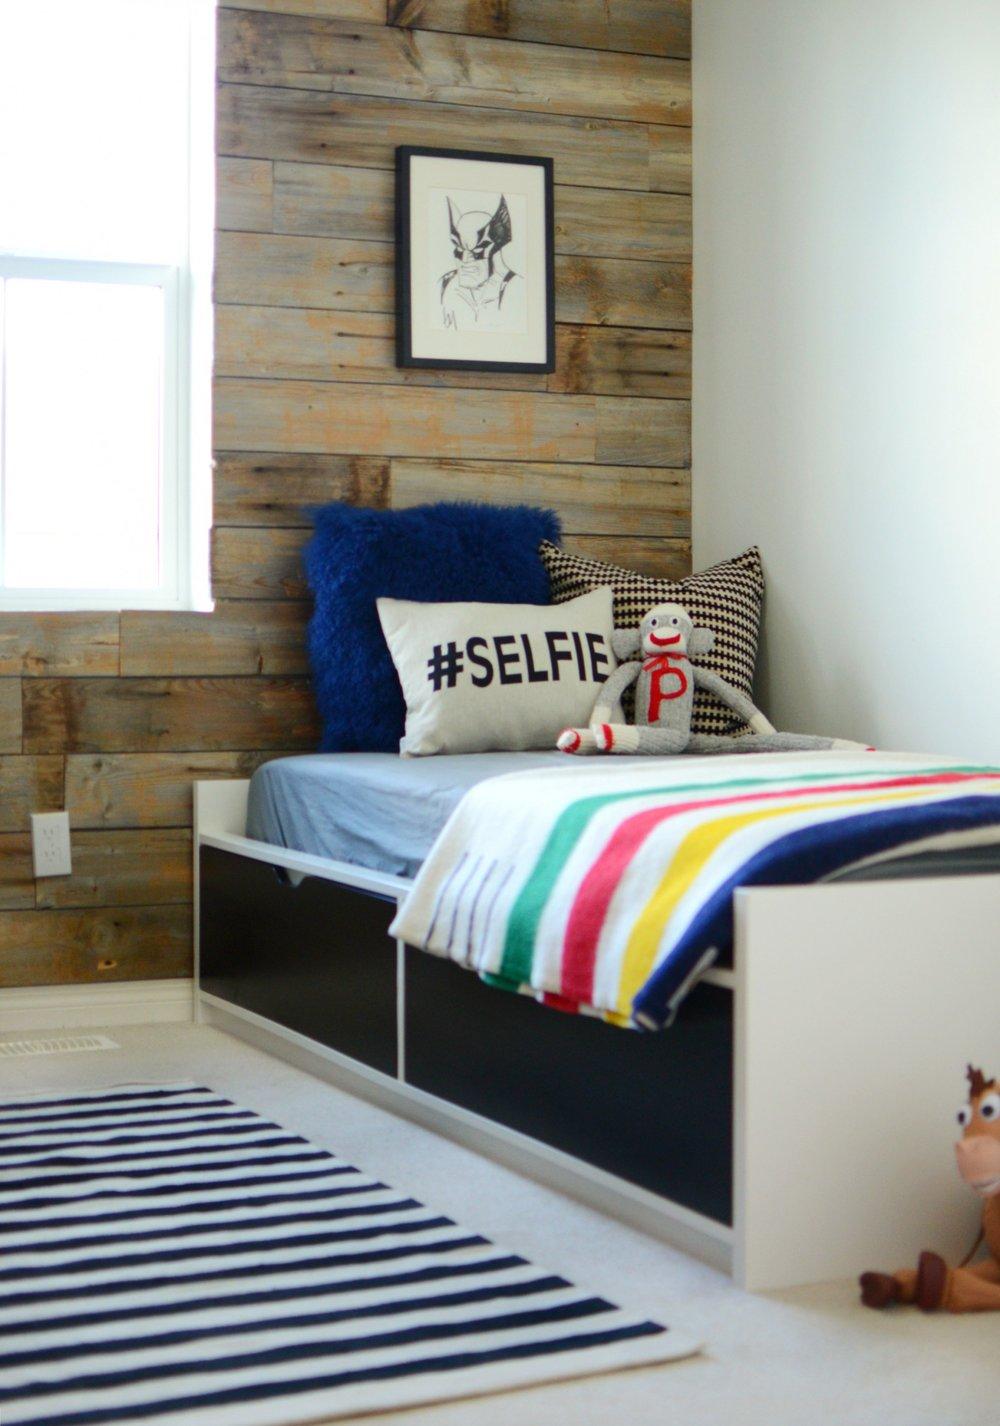 calgary-interior-designer-canadiana-boys-room-bed-wood-wall.jpg